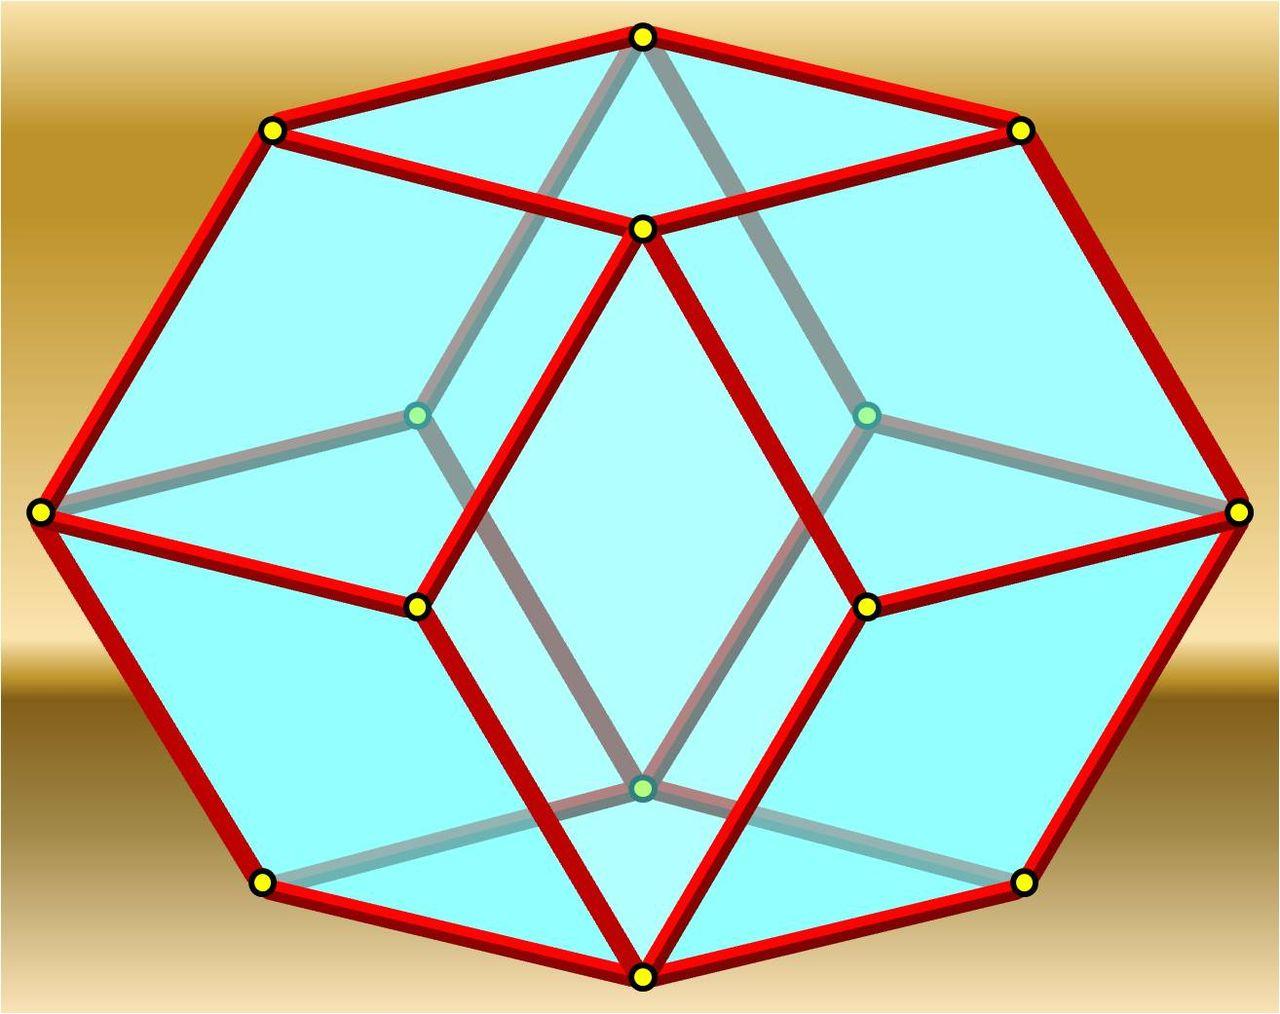 File:Dodecaedro rombico aureo.JPG - Wikimedia Commons